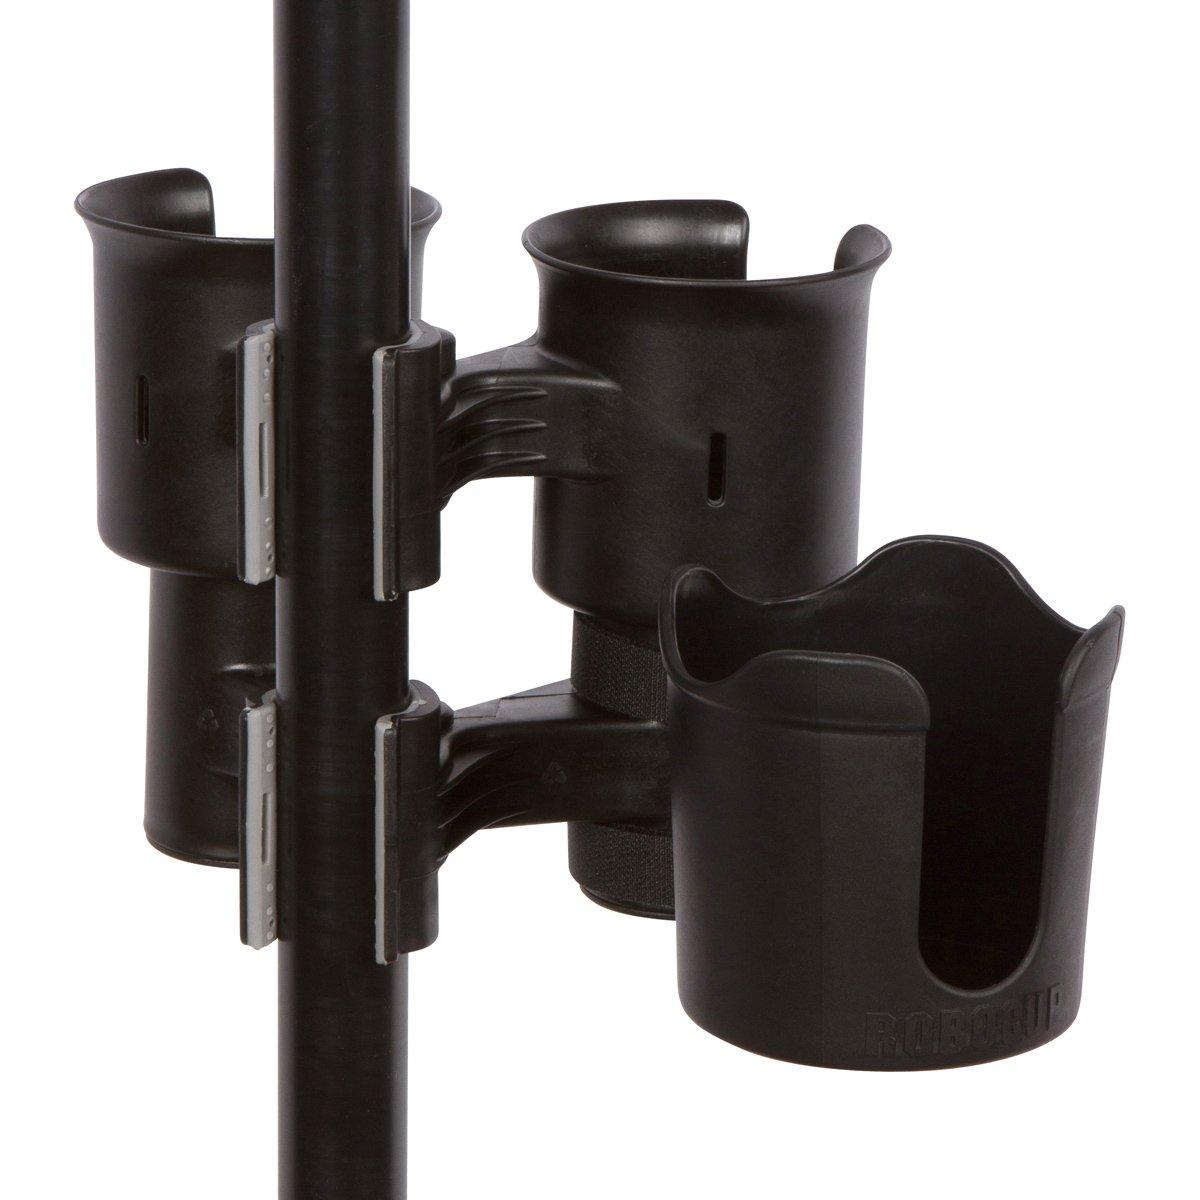 1 Black RoboCup Pluses attached to Black RoboCup